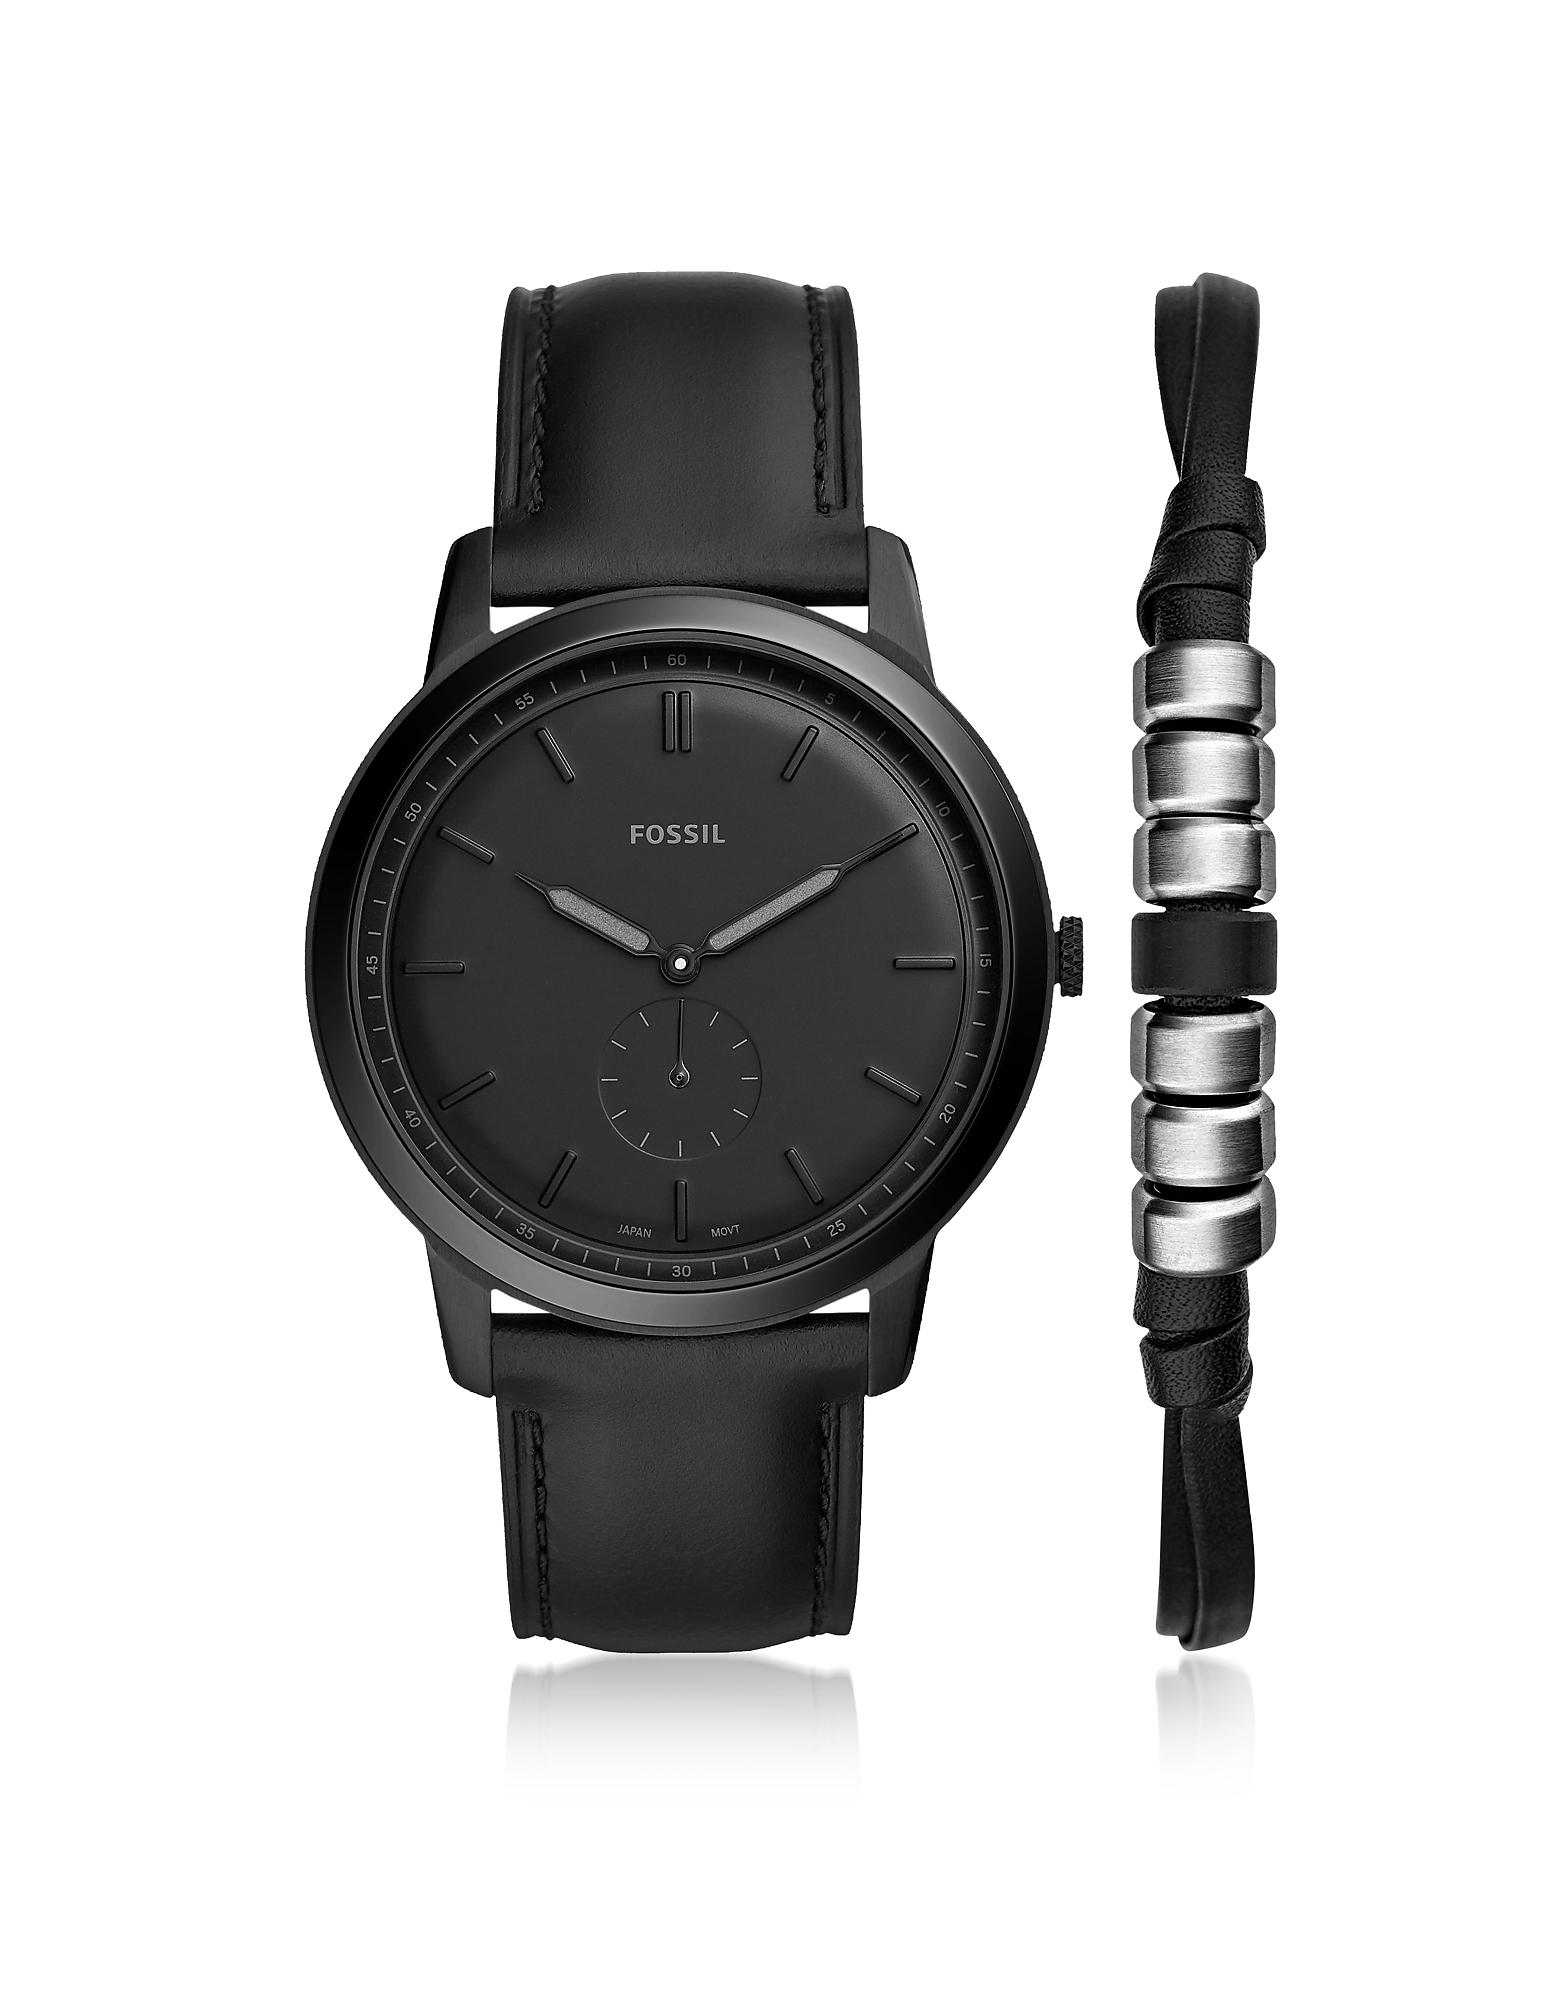 The Minimalist Two-Hand Black Leather Watch Box Set